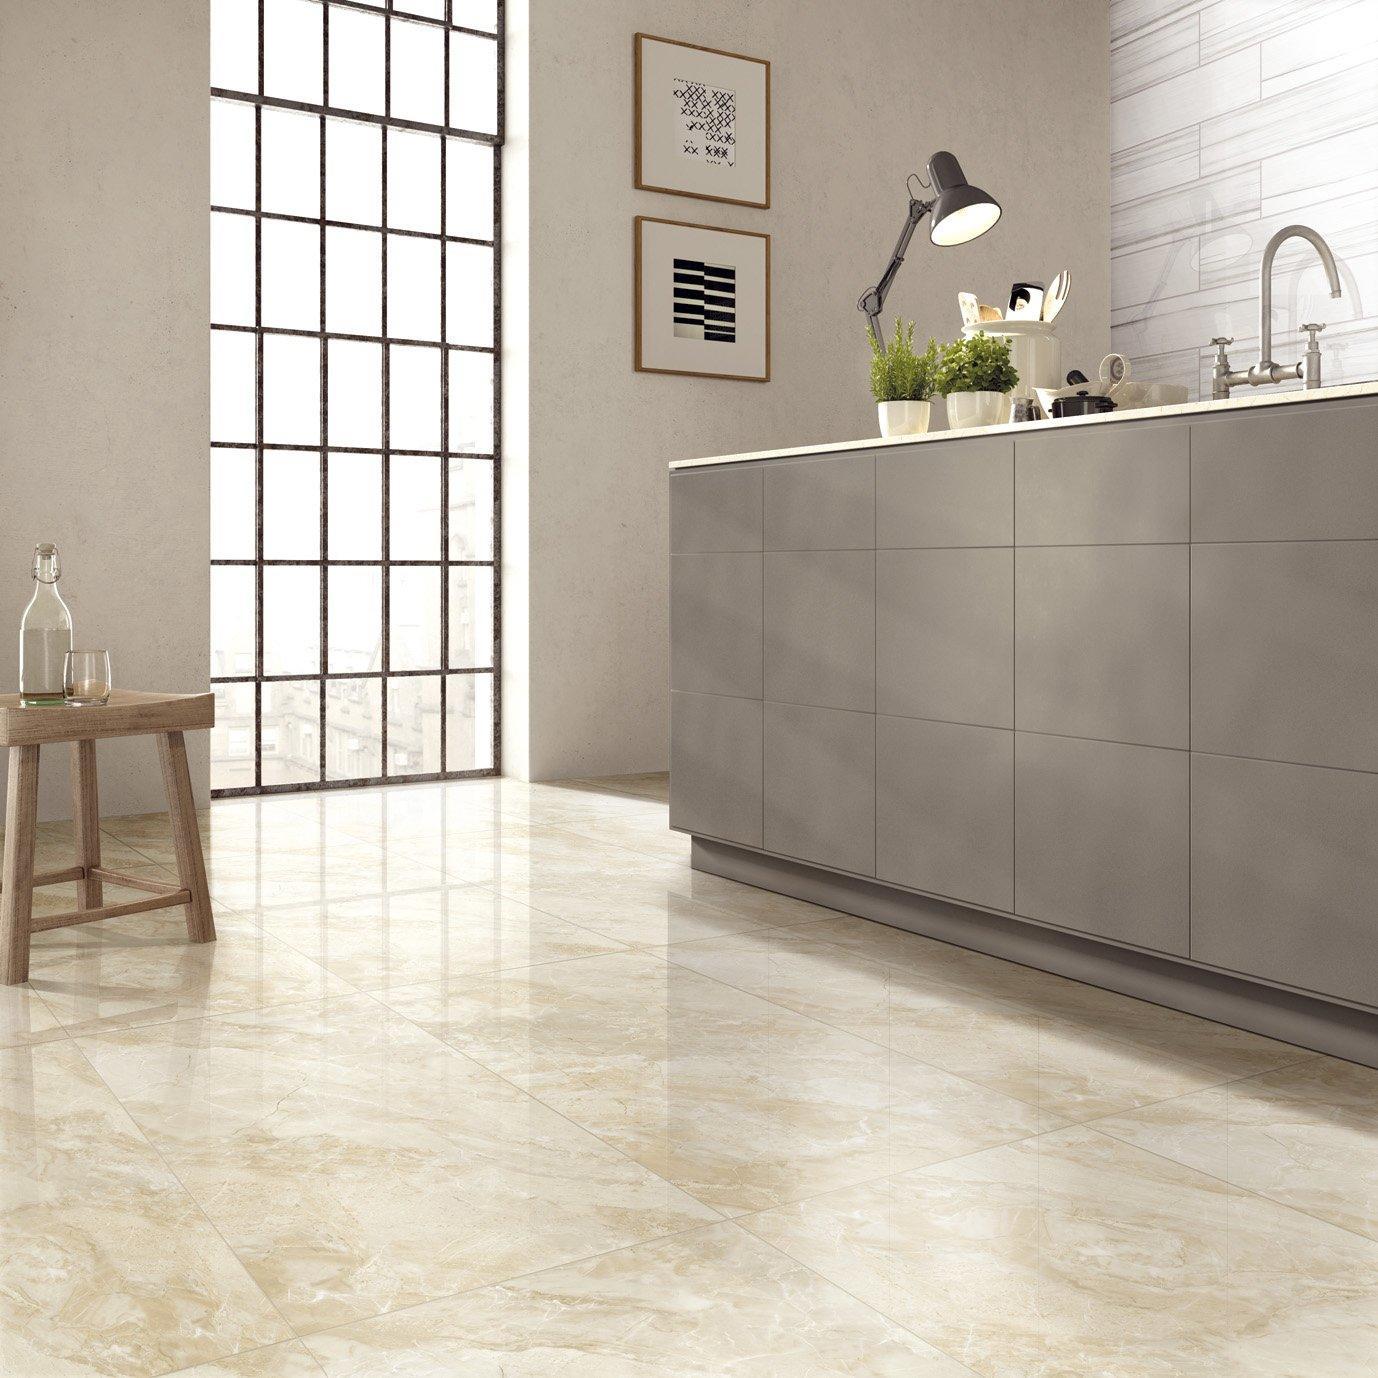 Carters Beige Full body porcelain Marble tiles  VDLS1261733YJT 60x120cm/24x48'